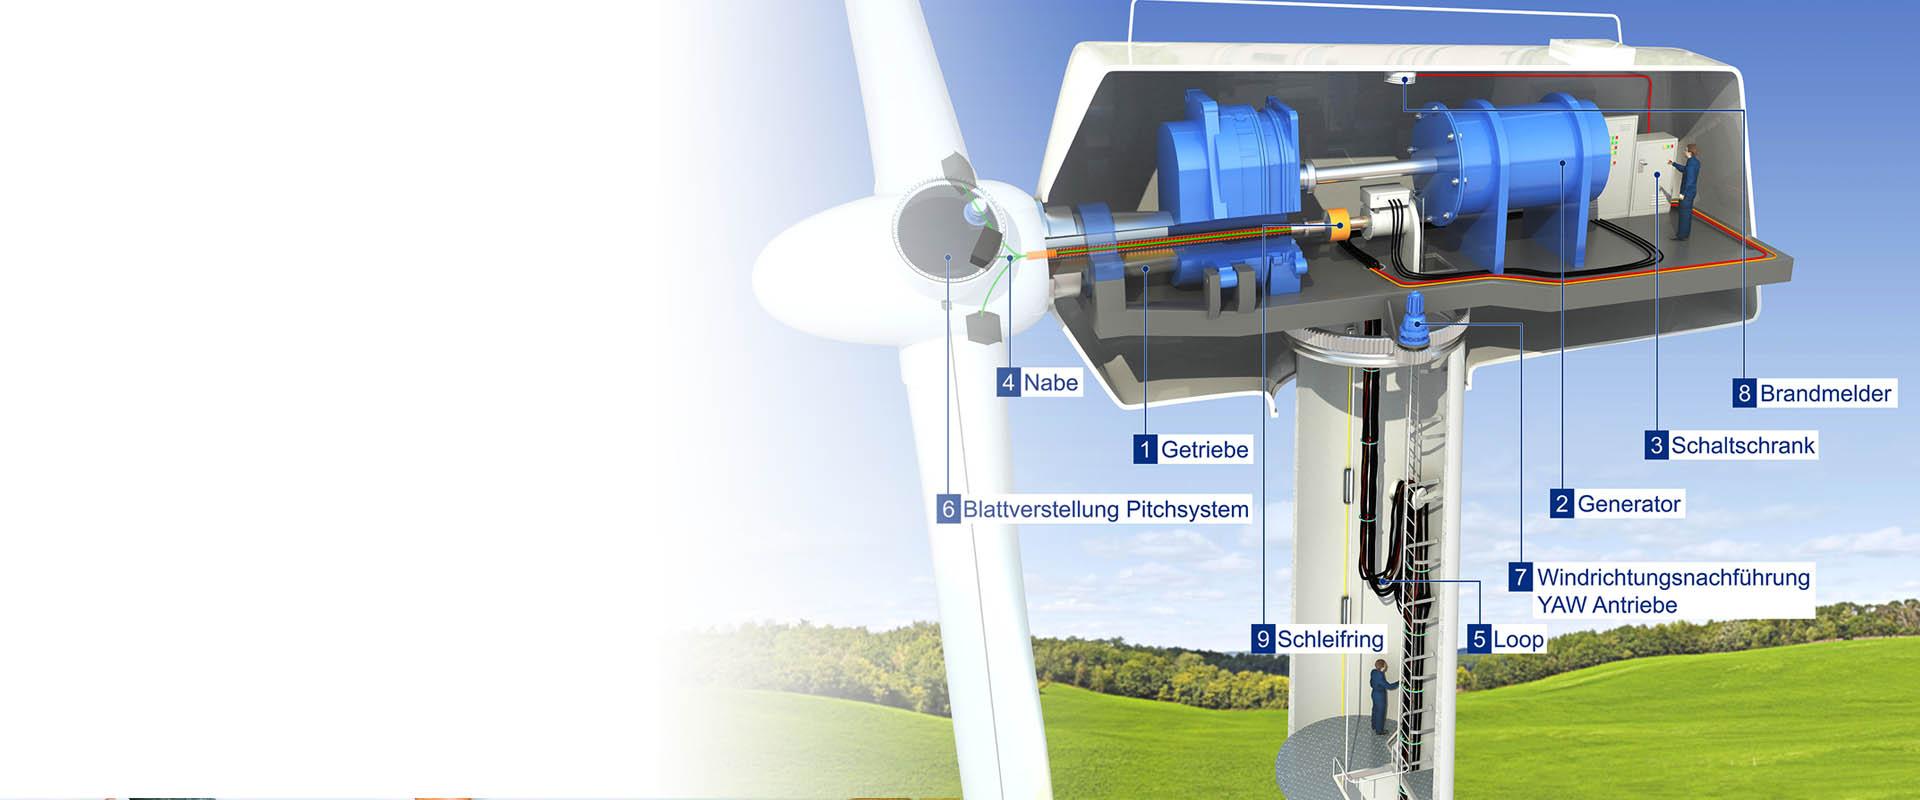 3D Modell Windturbine